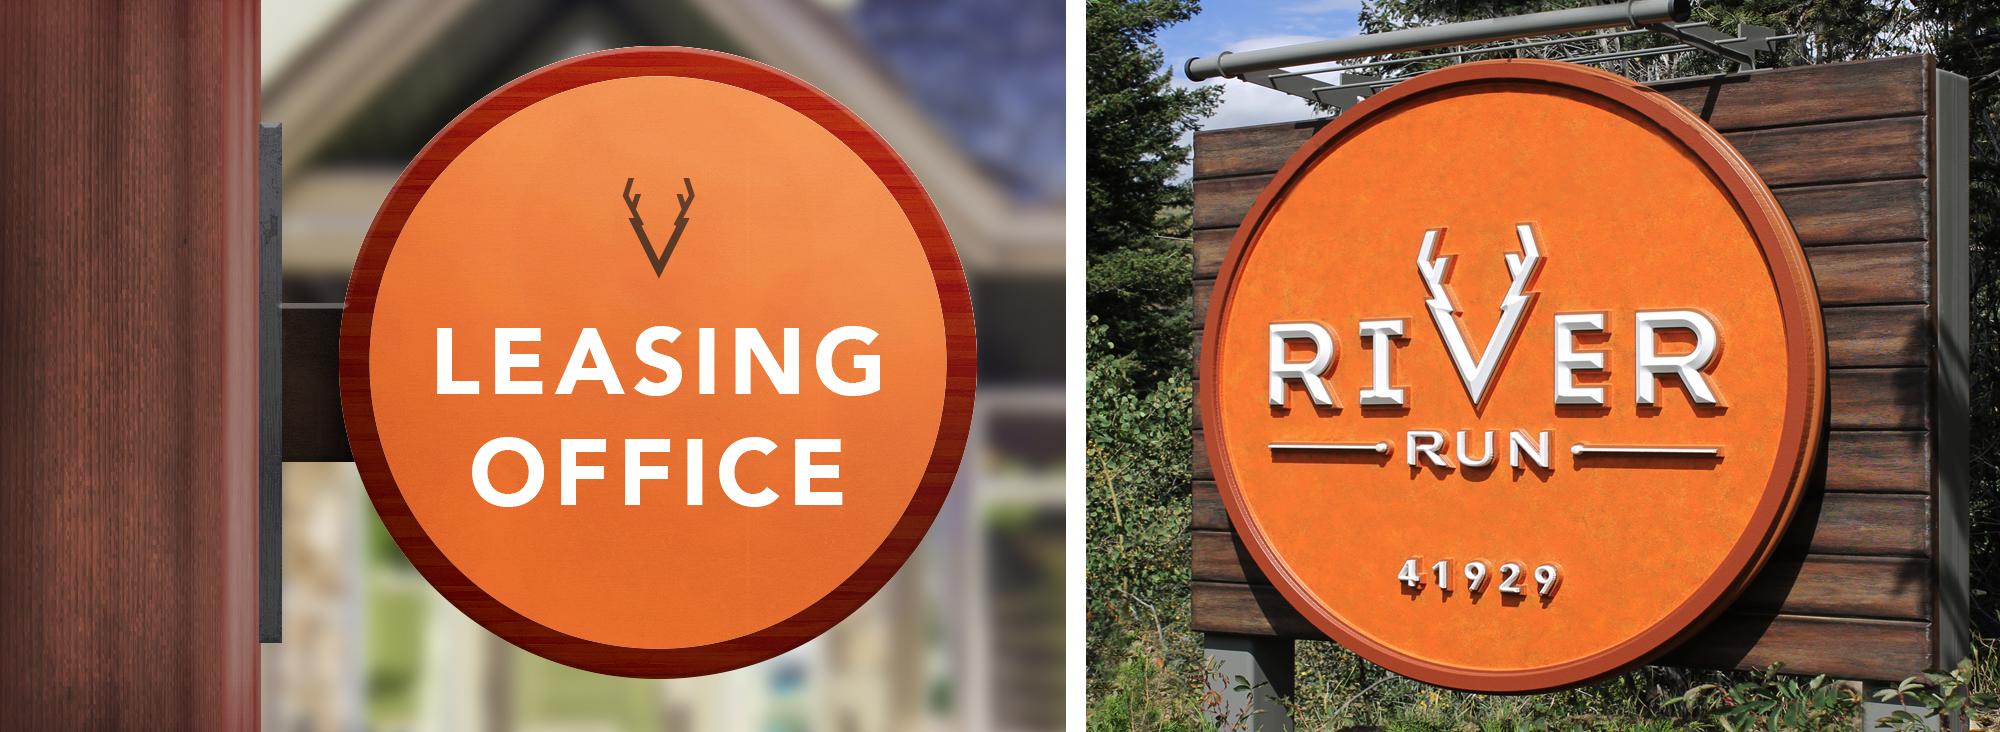 rr-signage